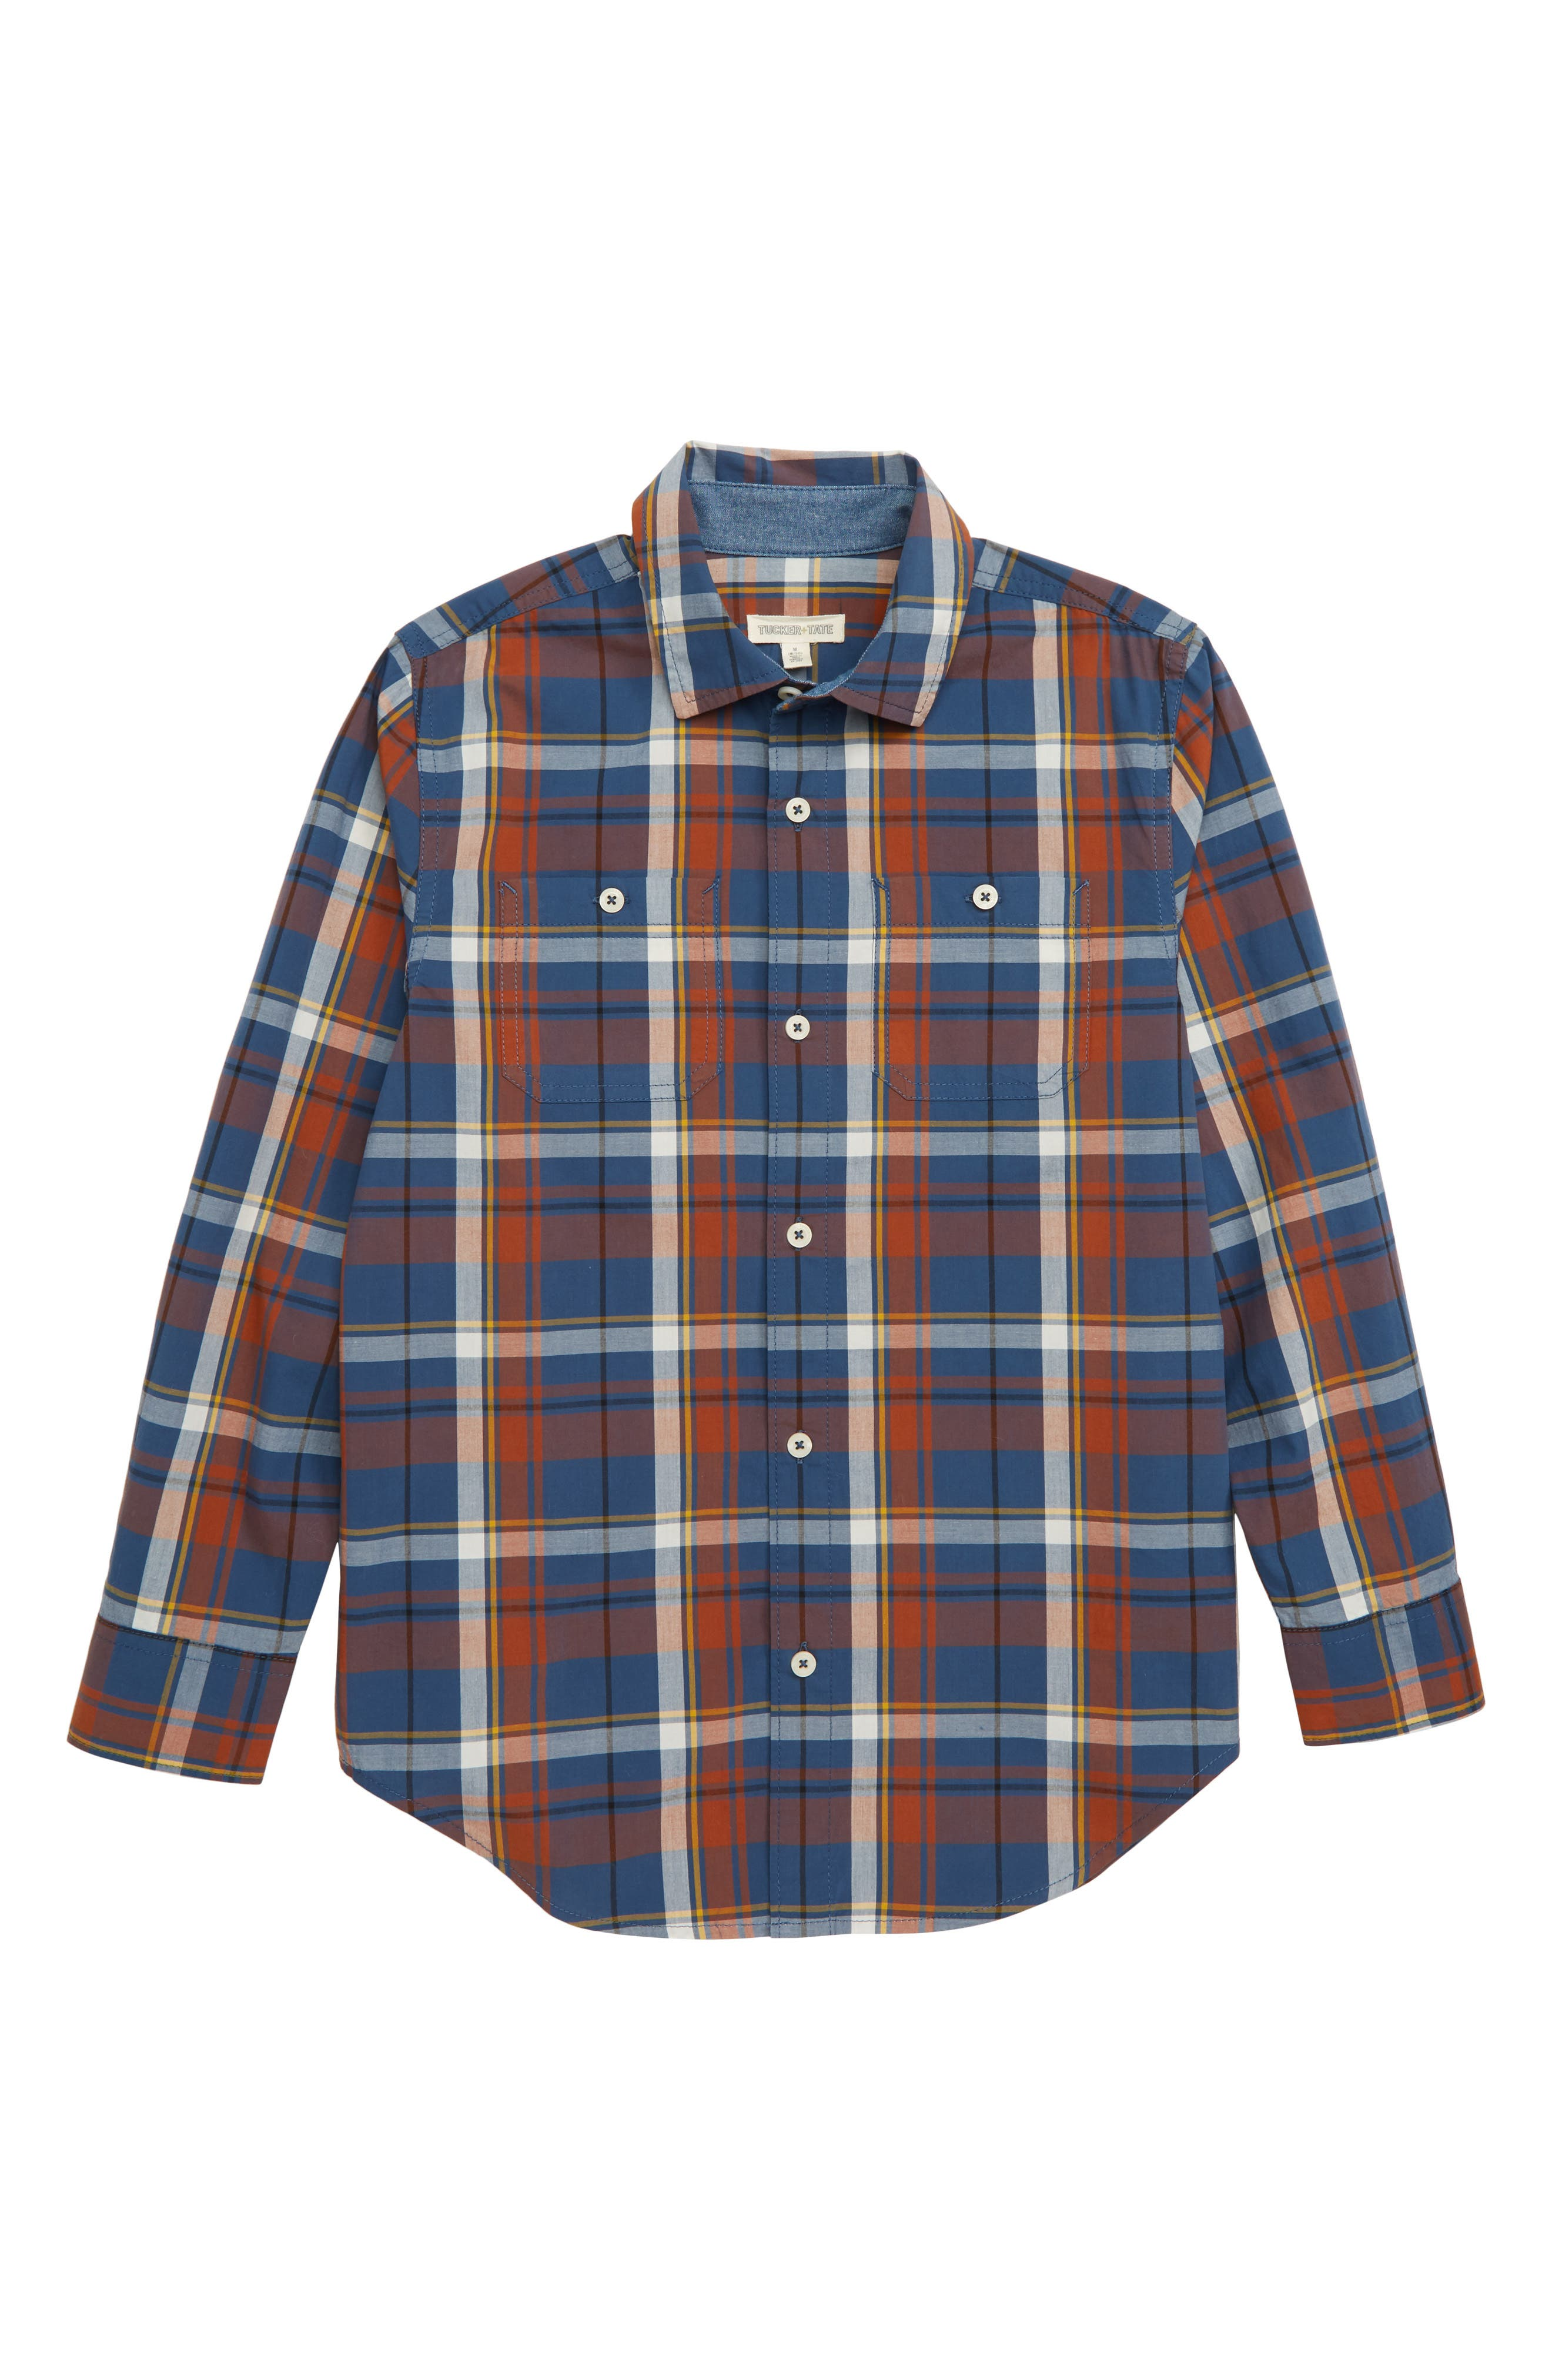 'Photo Op' Long Sleeve Cotton Woven Shirt,                         Main,                         color, NAVY DENIM MADRAS PLAID